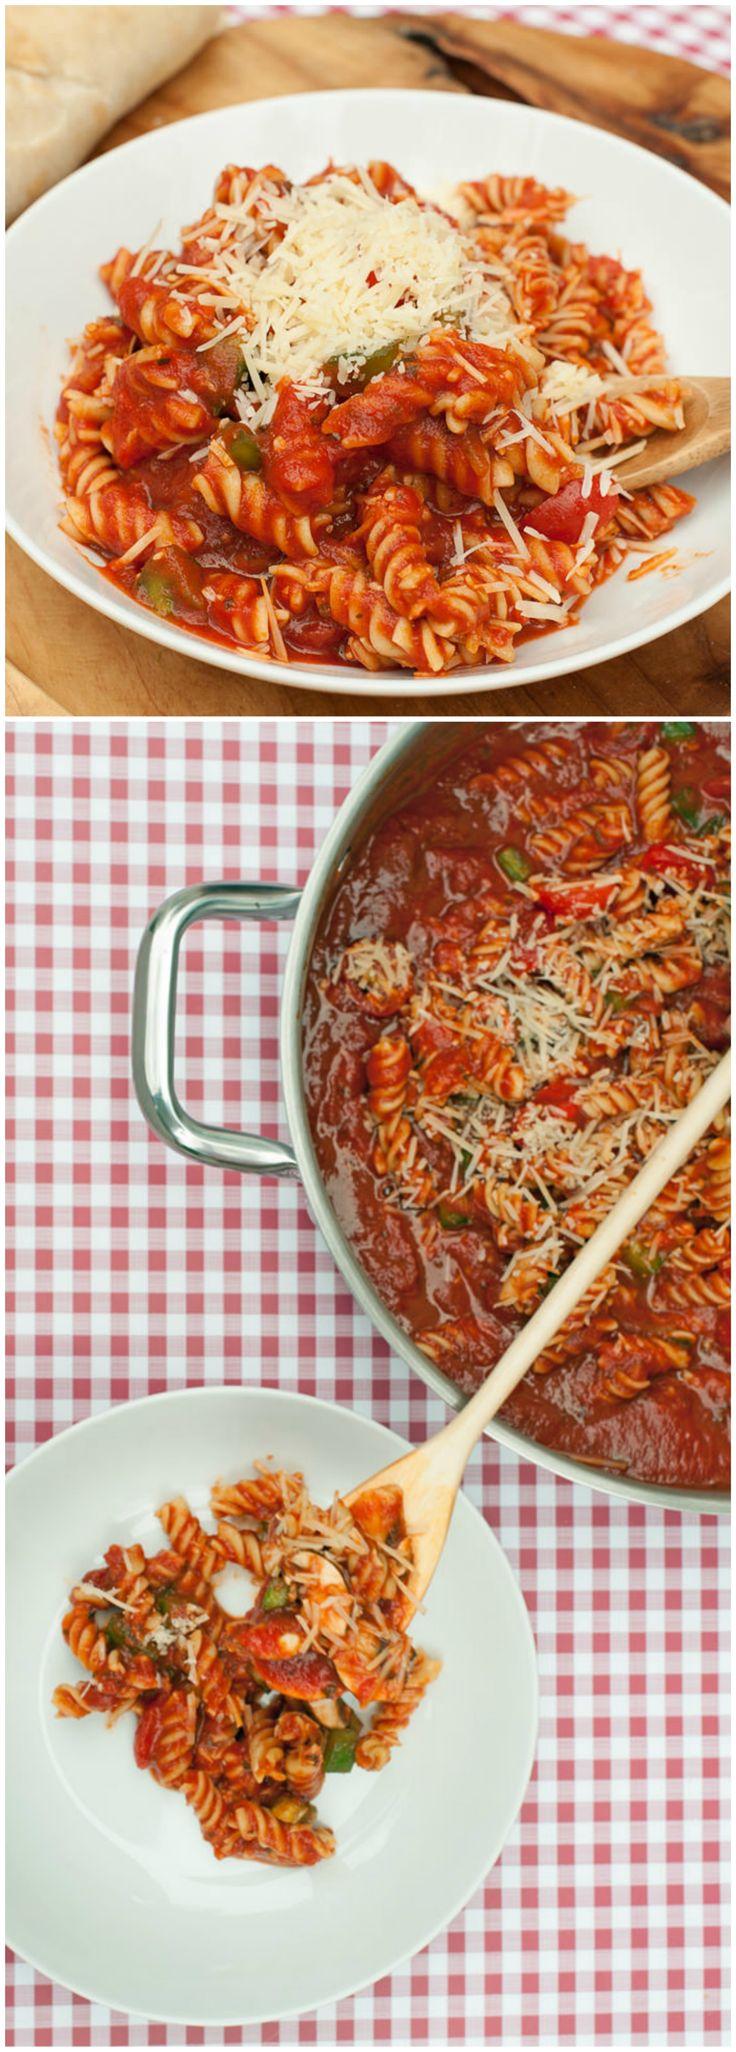 108 best One Pot Pasta Recipes images on Pinterest | Pasta recipes ...